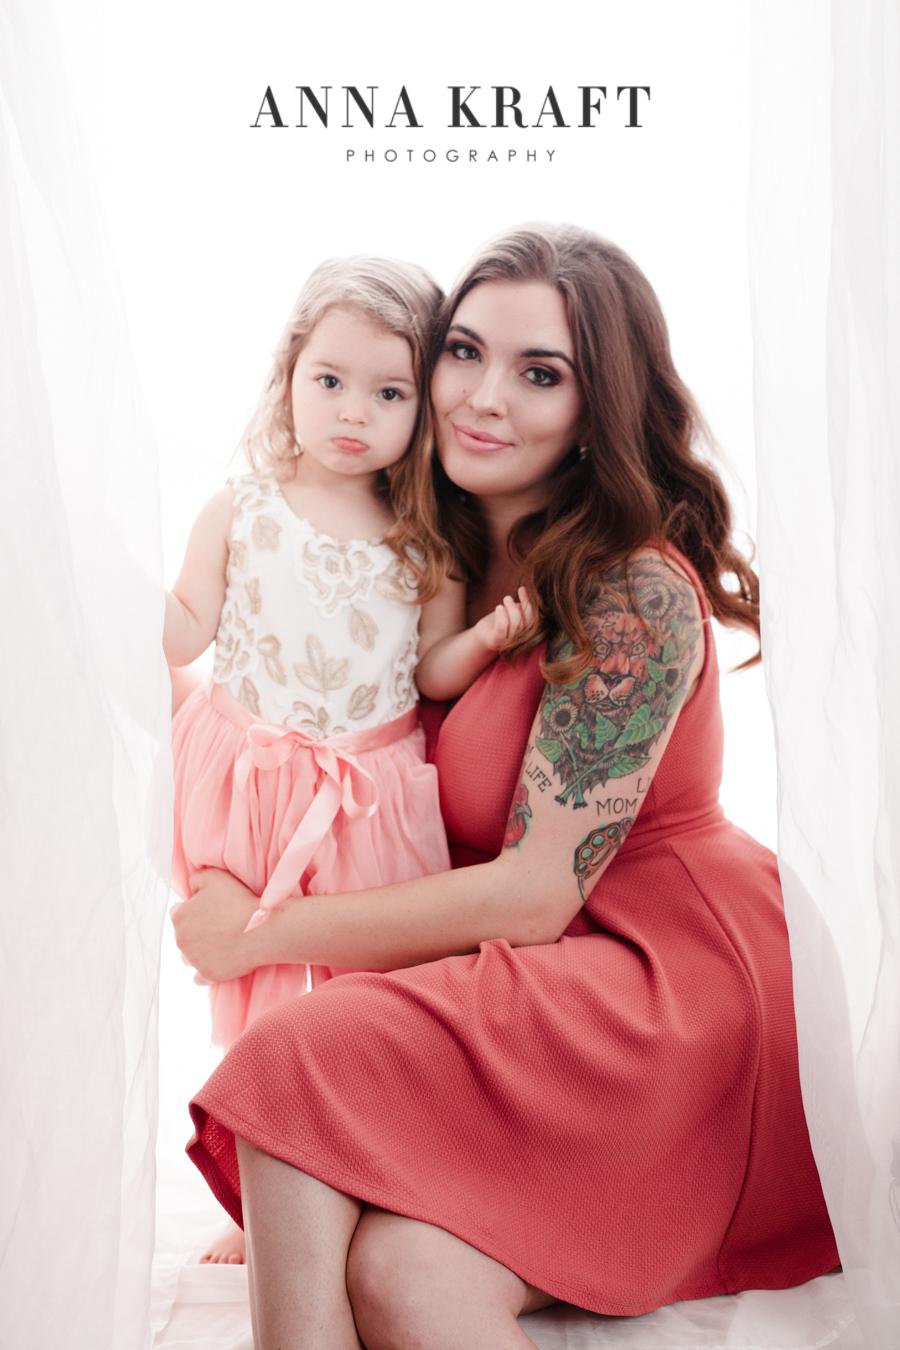 anna_kraft_photography_georgetown_square_studio_family_motherhood_daughter_portrait-17.jpg